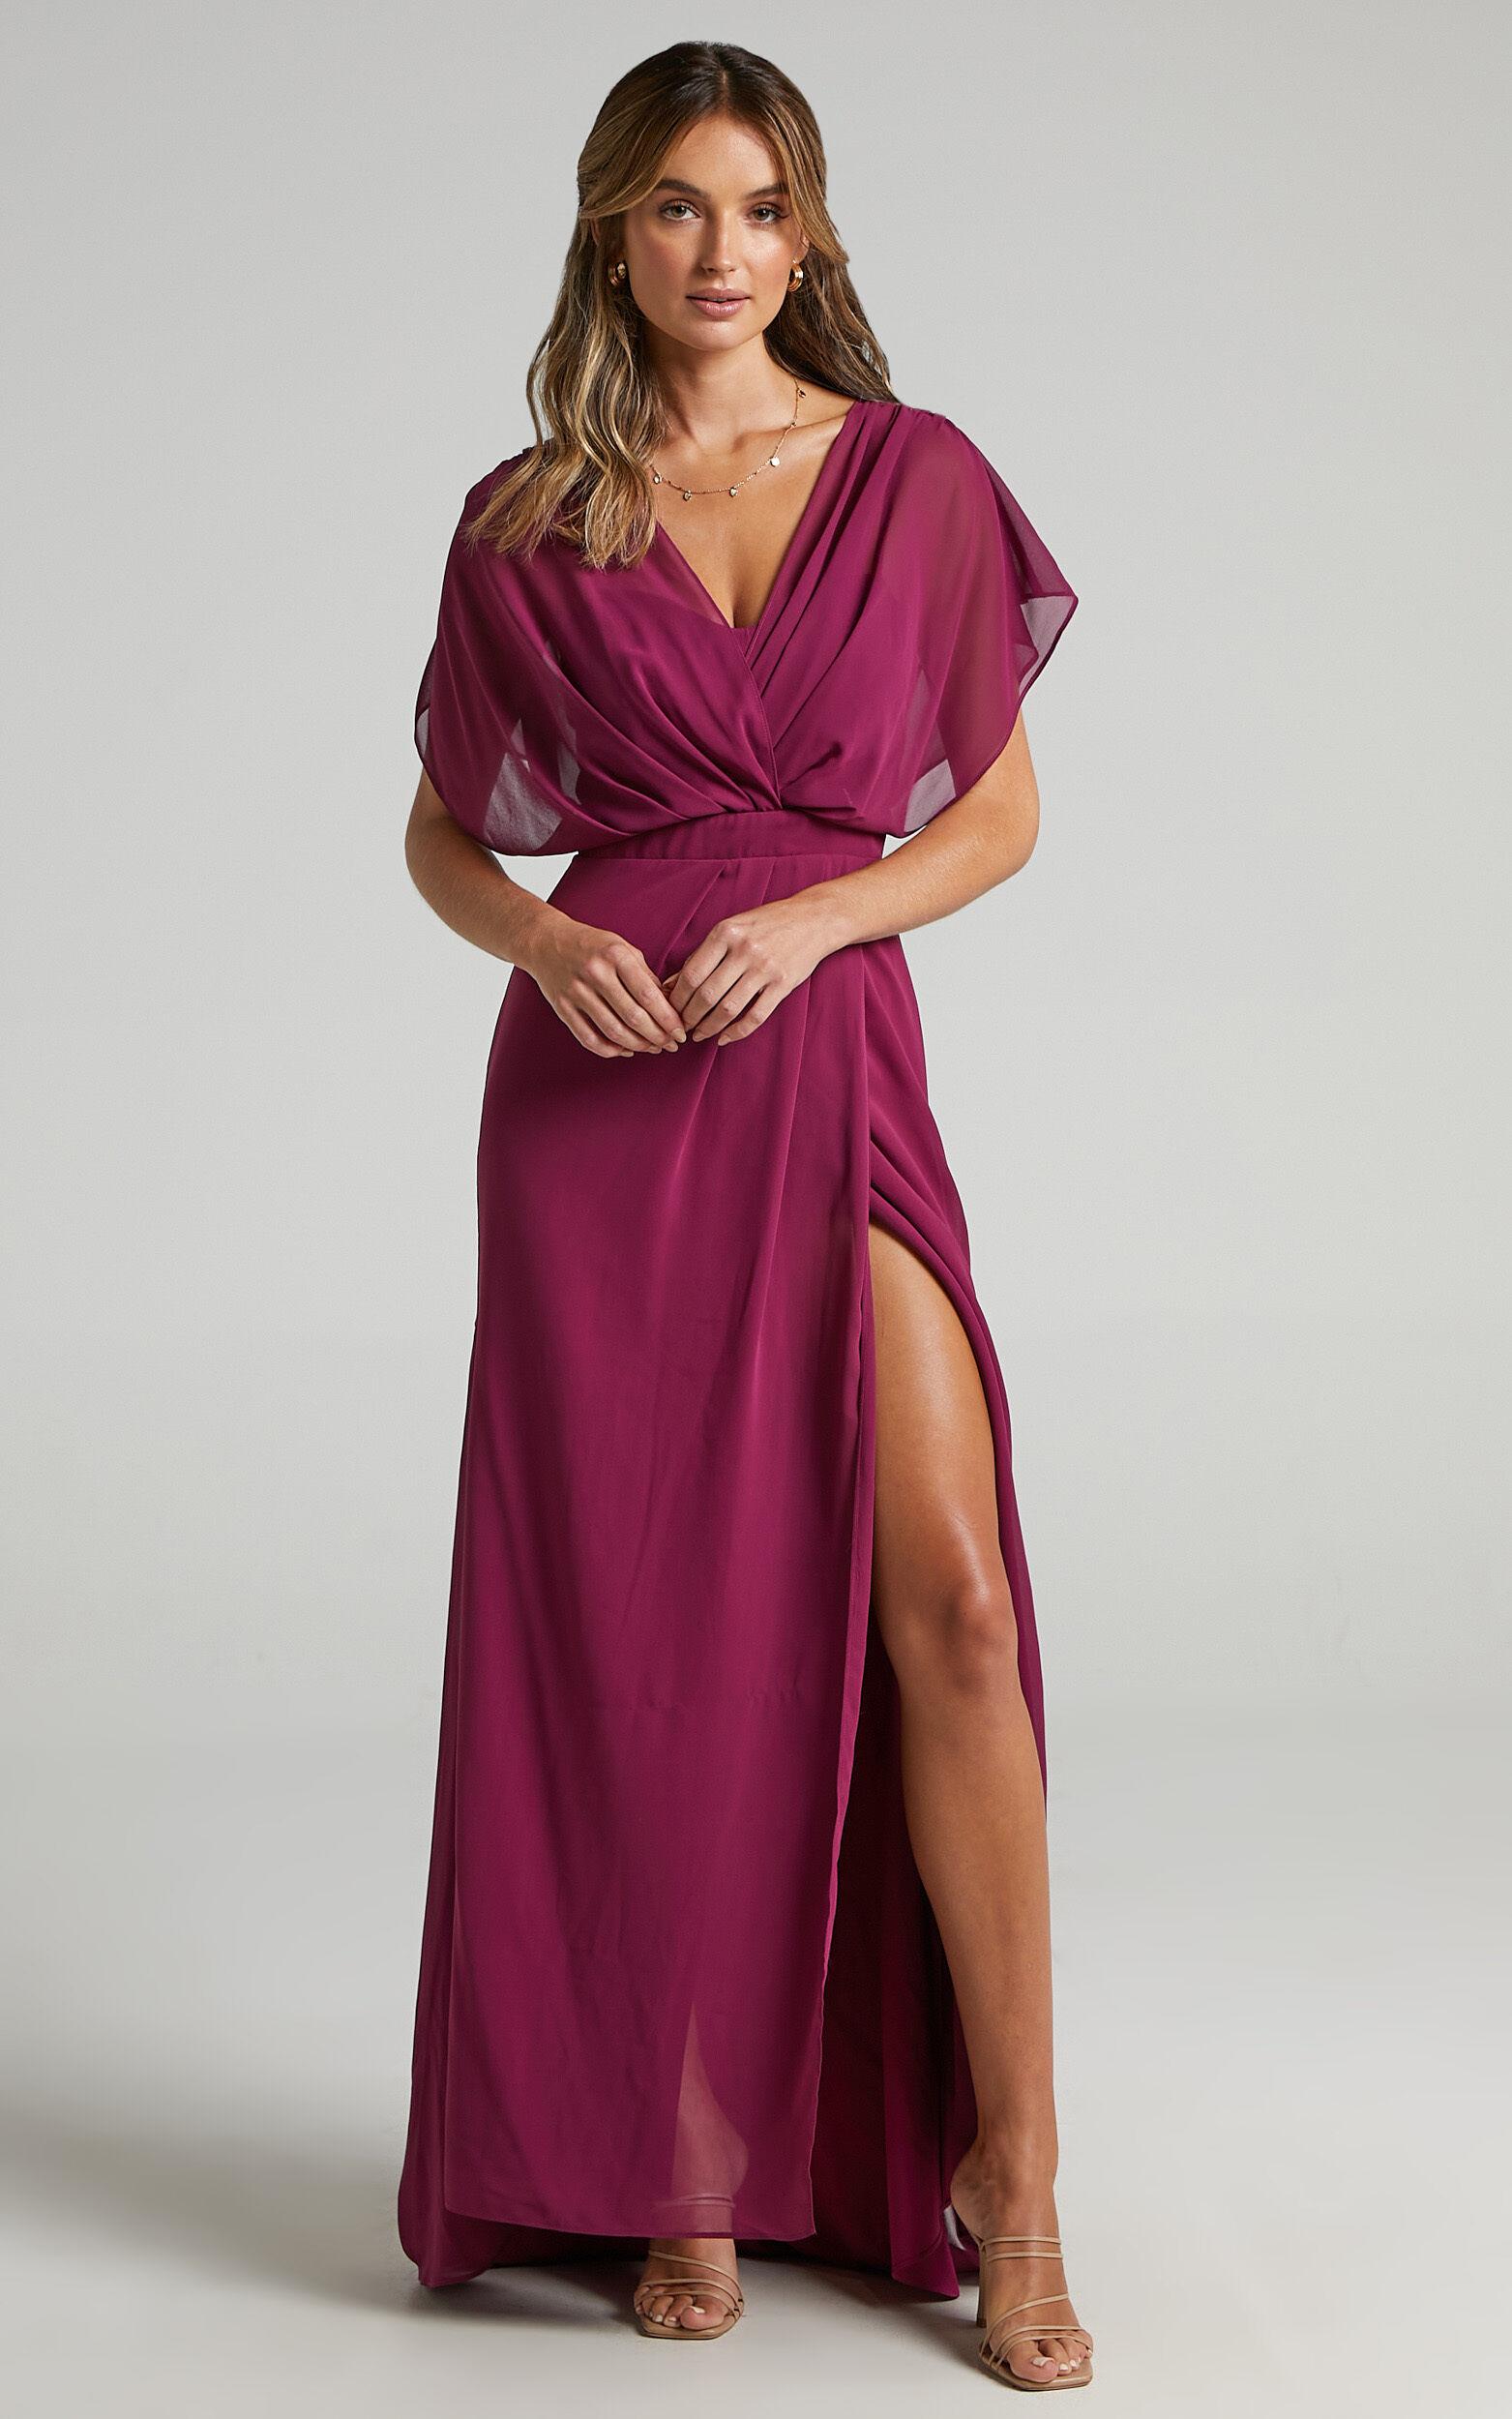 Lovers Gaze Dress in Mulberry - 06, PRP2, super-hi-res image number null